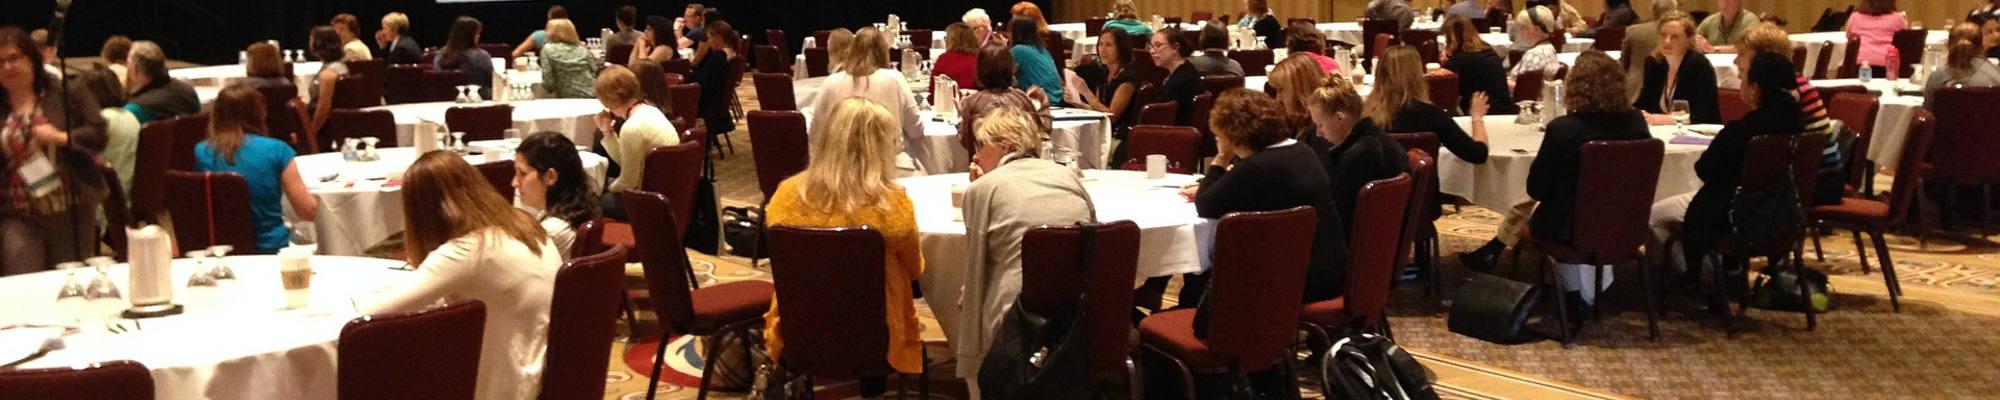 Rosensteel Hall Meeting & Event Facilities